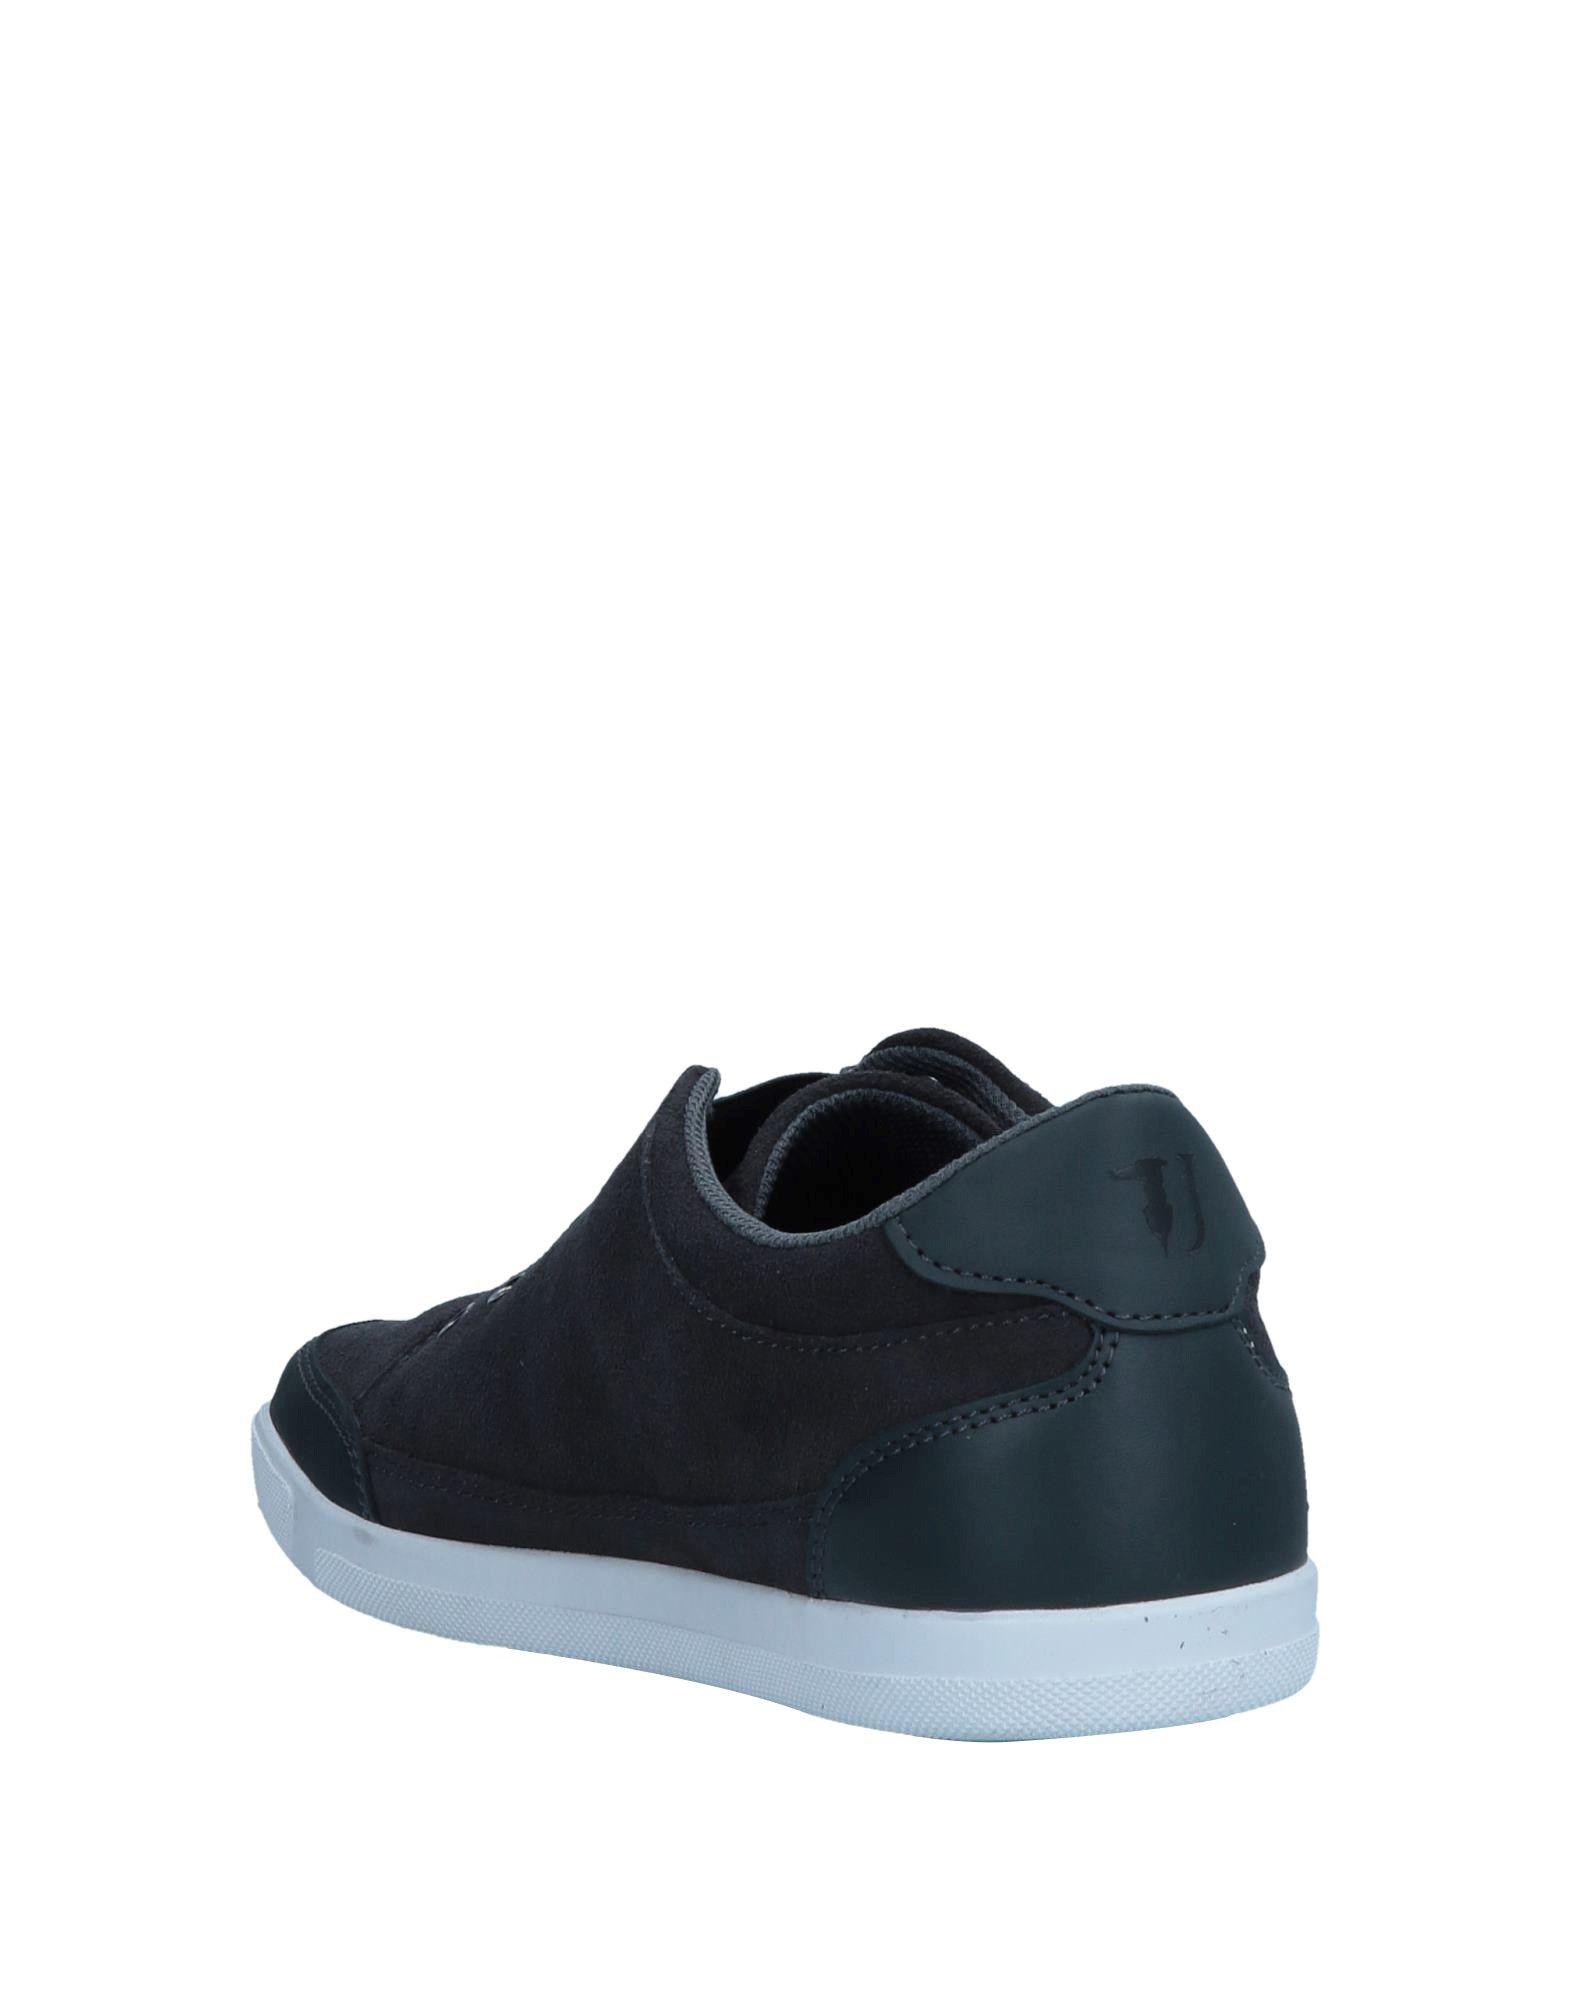 Rabatt Sneakers echte Schuhe Trussardi Jeans Sneakers Rabatt Herren  11547681PK e1dfb3